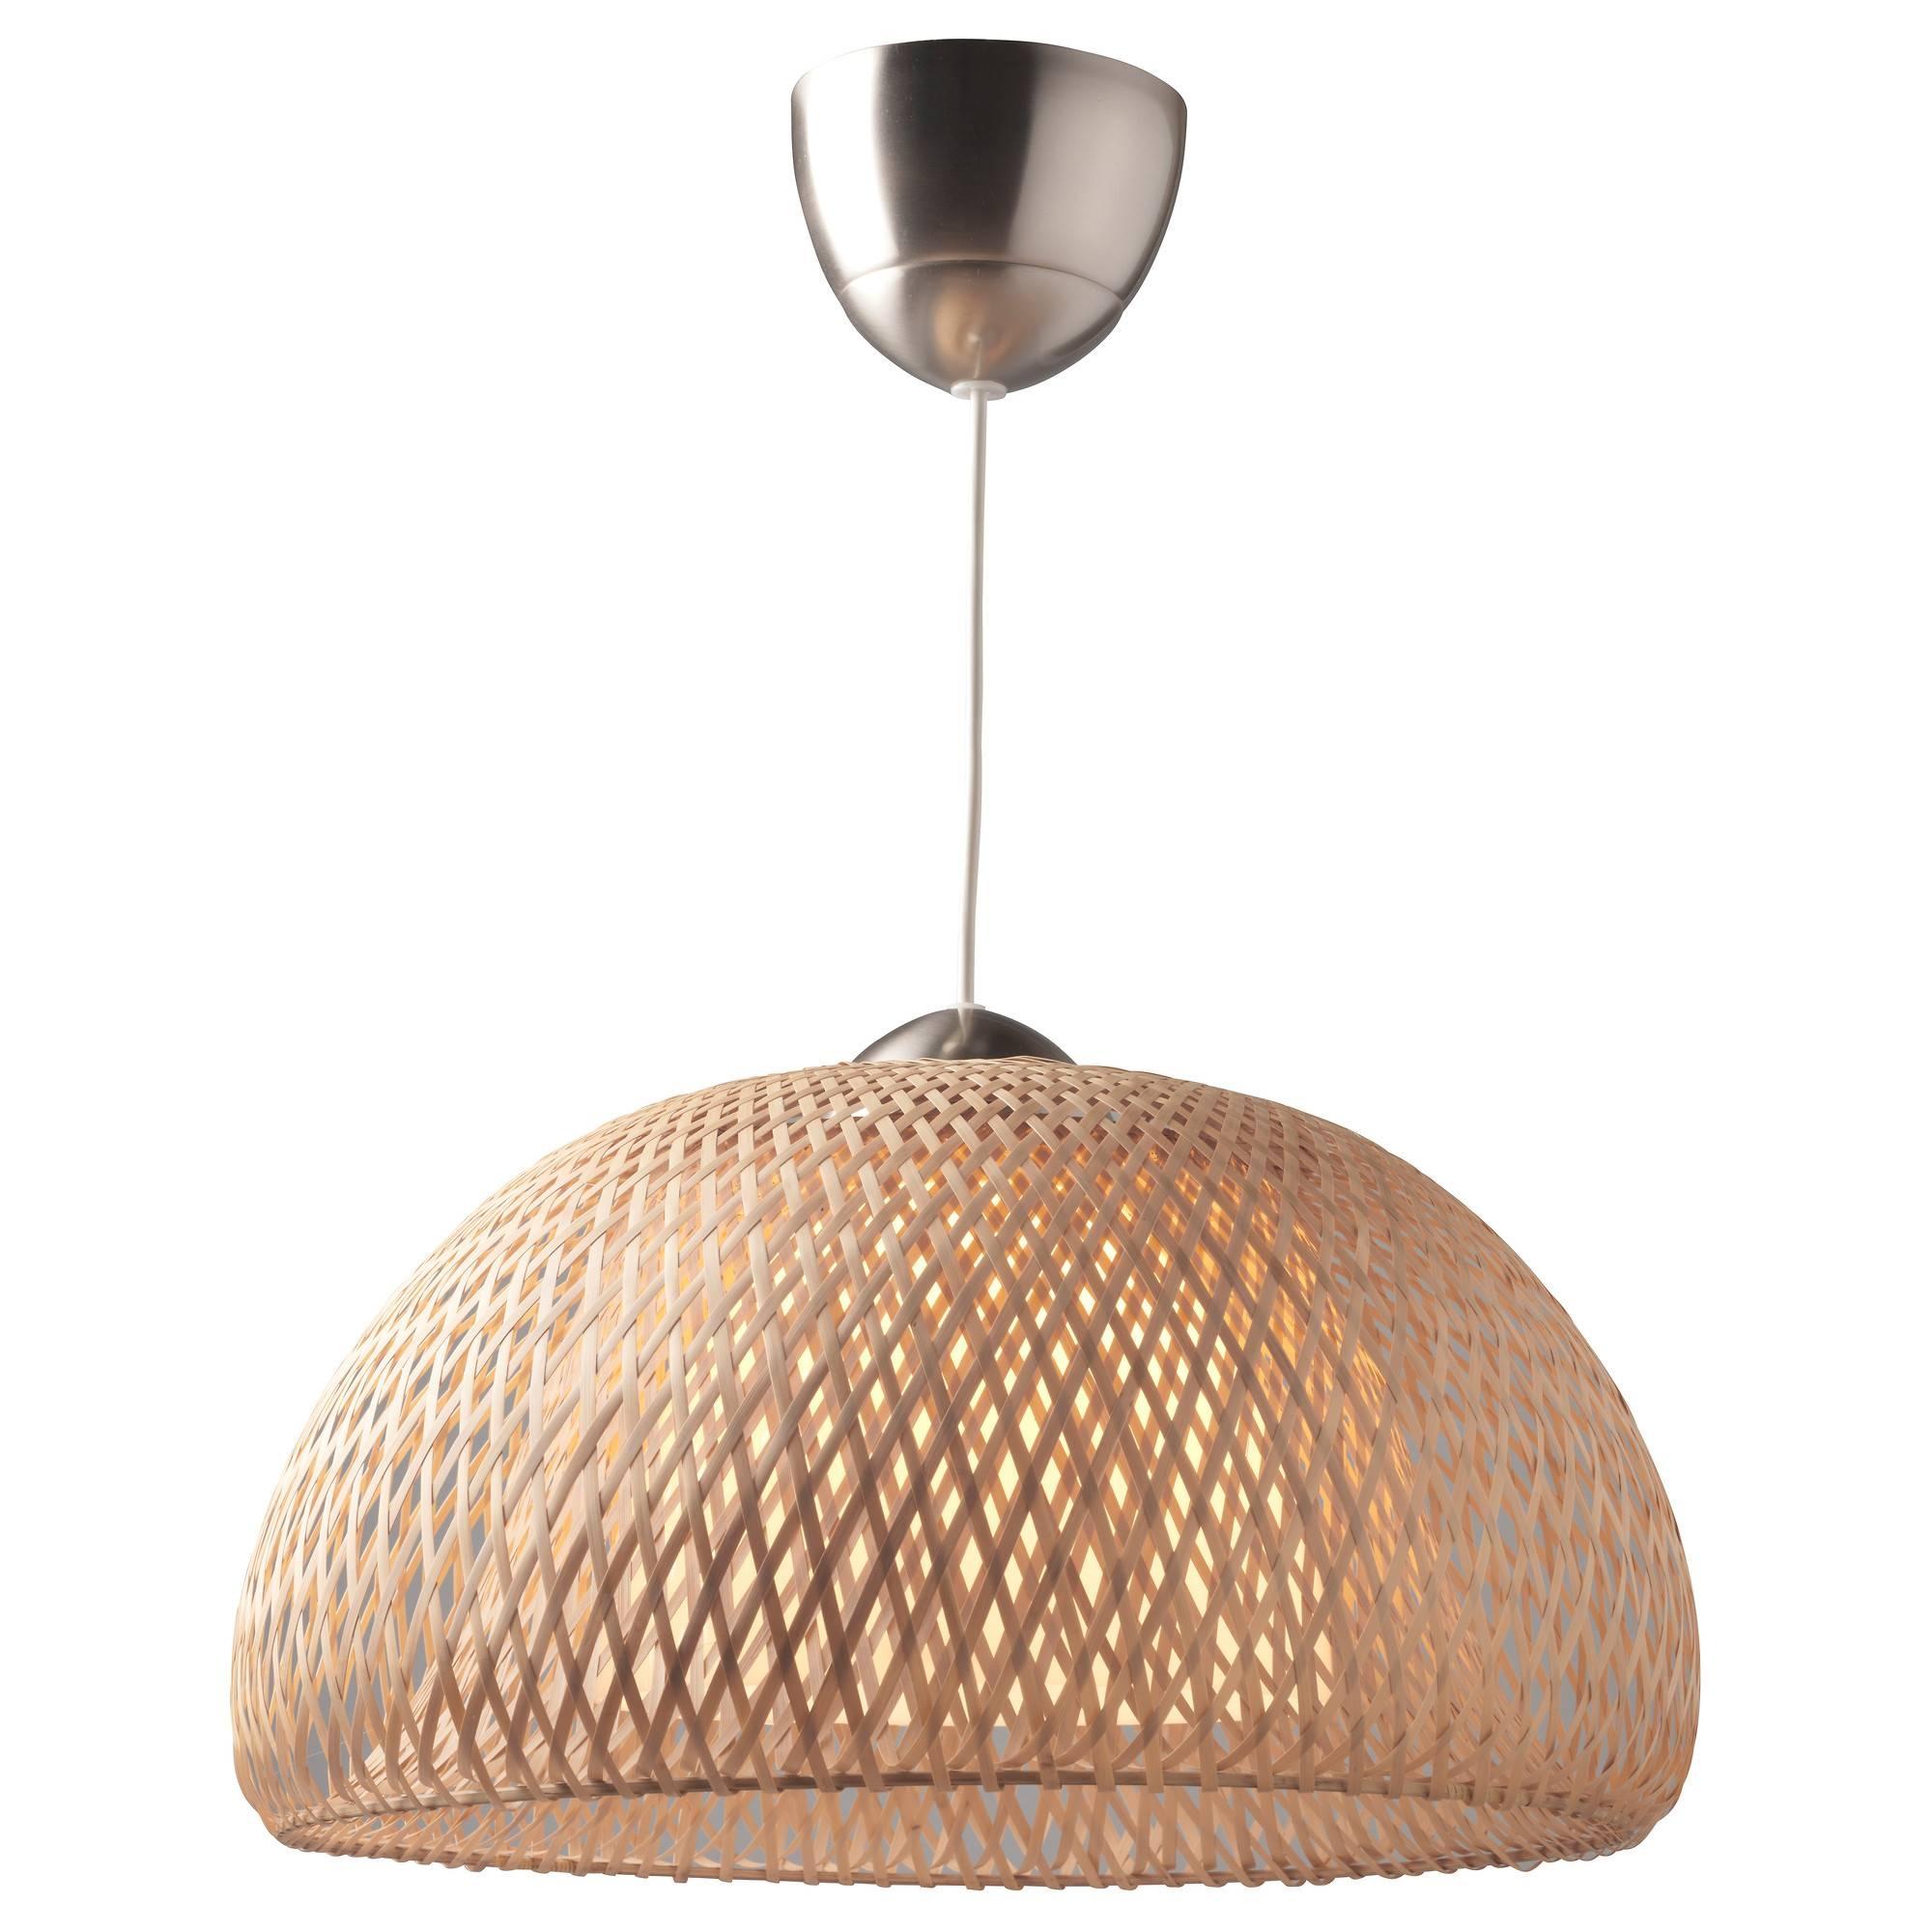 Pendant Lights & Lamp Shades - Ikea in Rattan Pendant Lighting (Image 13 of 15)